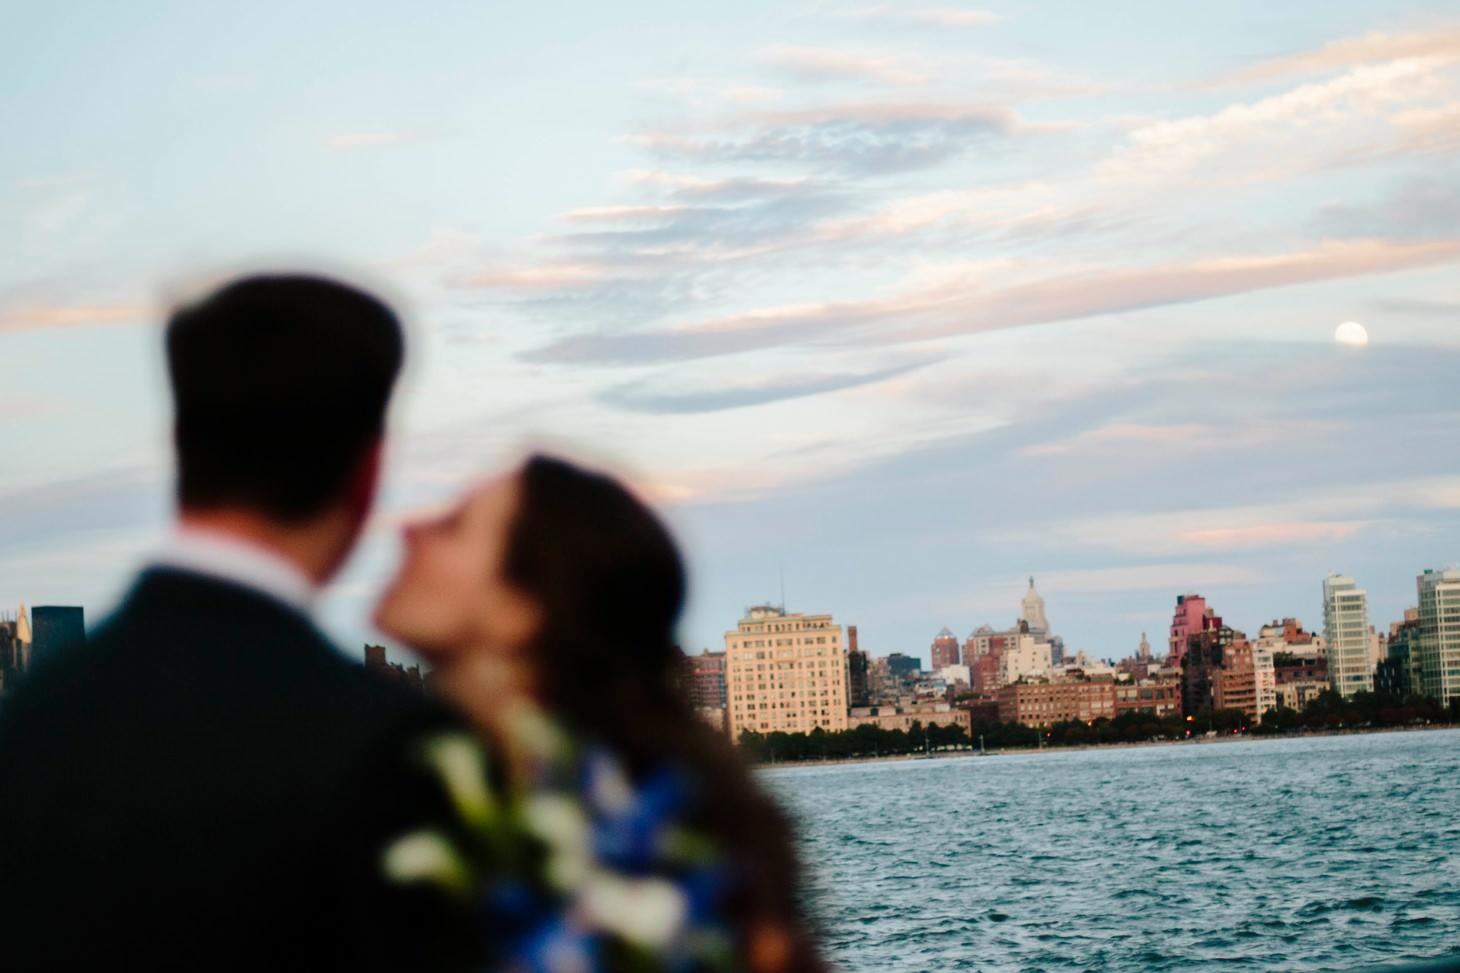 036-nyc-wedding-photographer-hoboken-waterfront-wedding-photos-smitten-chickens.jpg